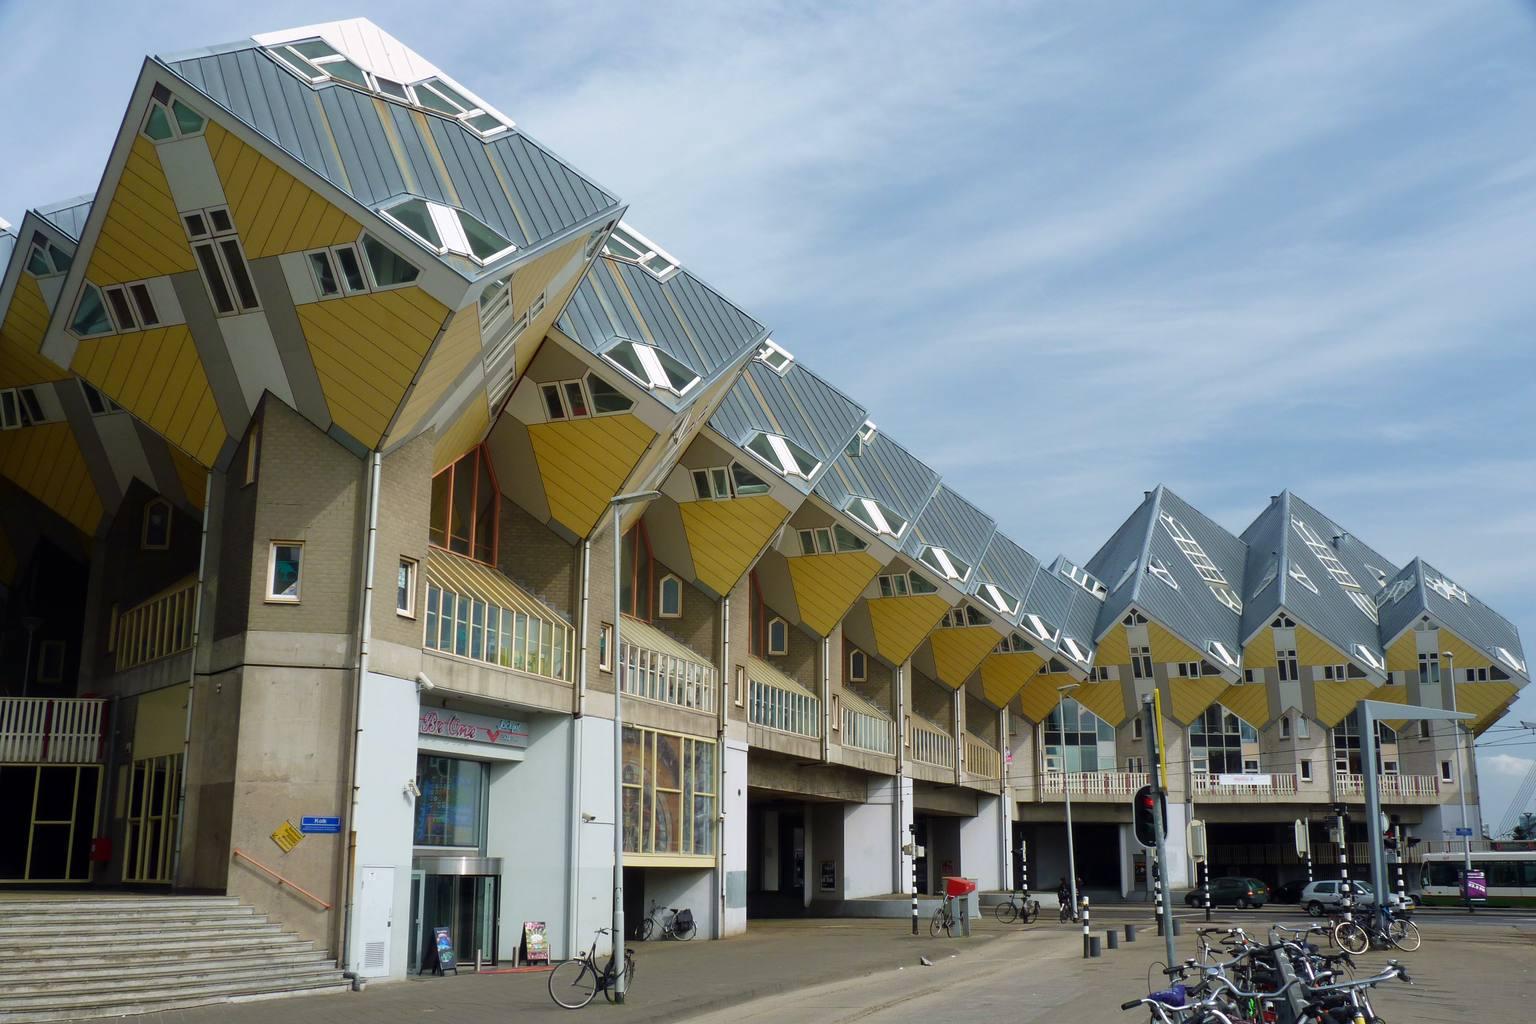 Cube house - Wikipedia